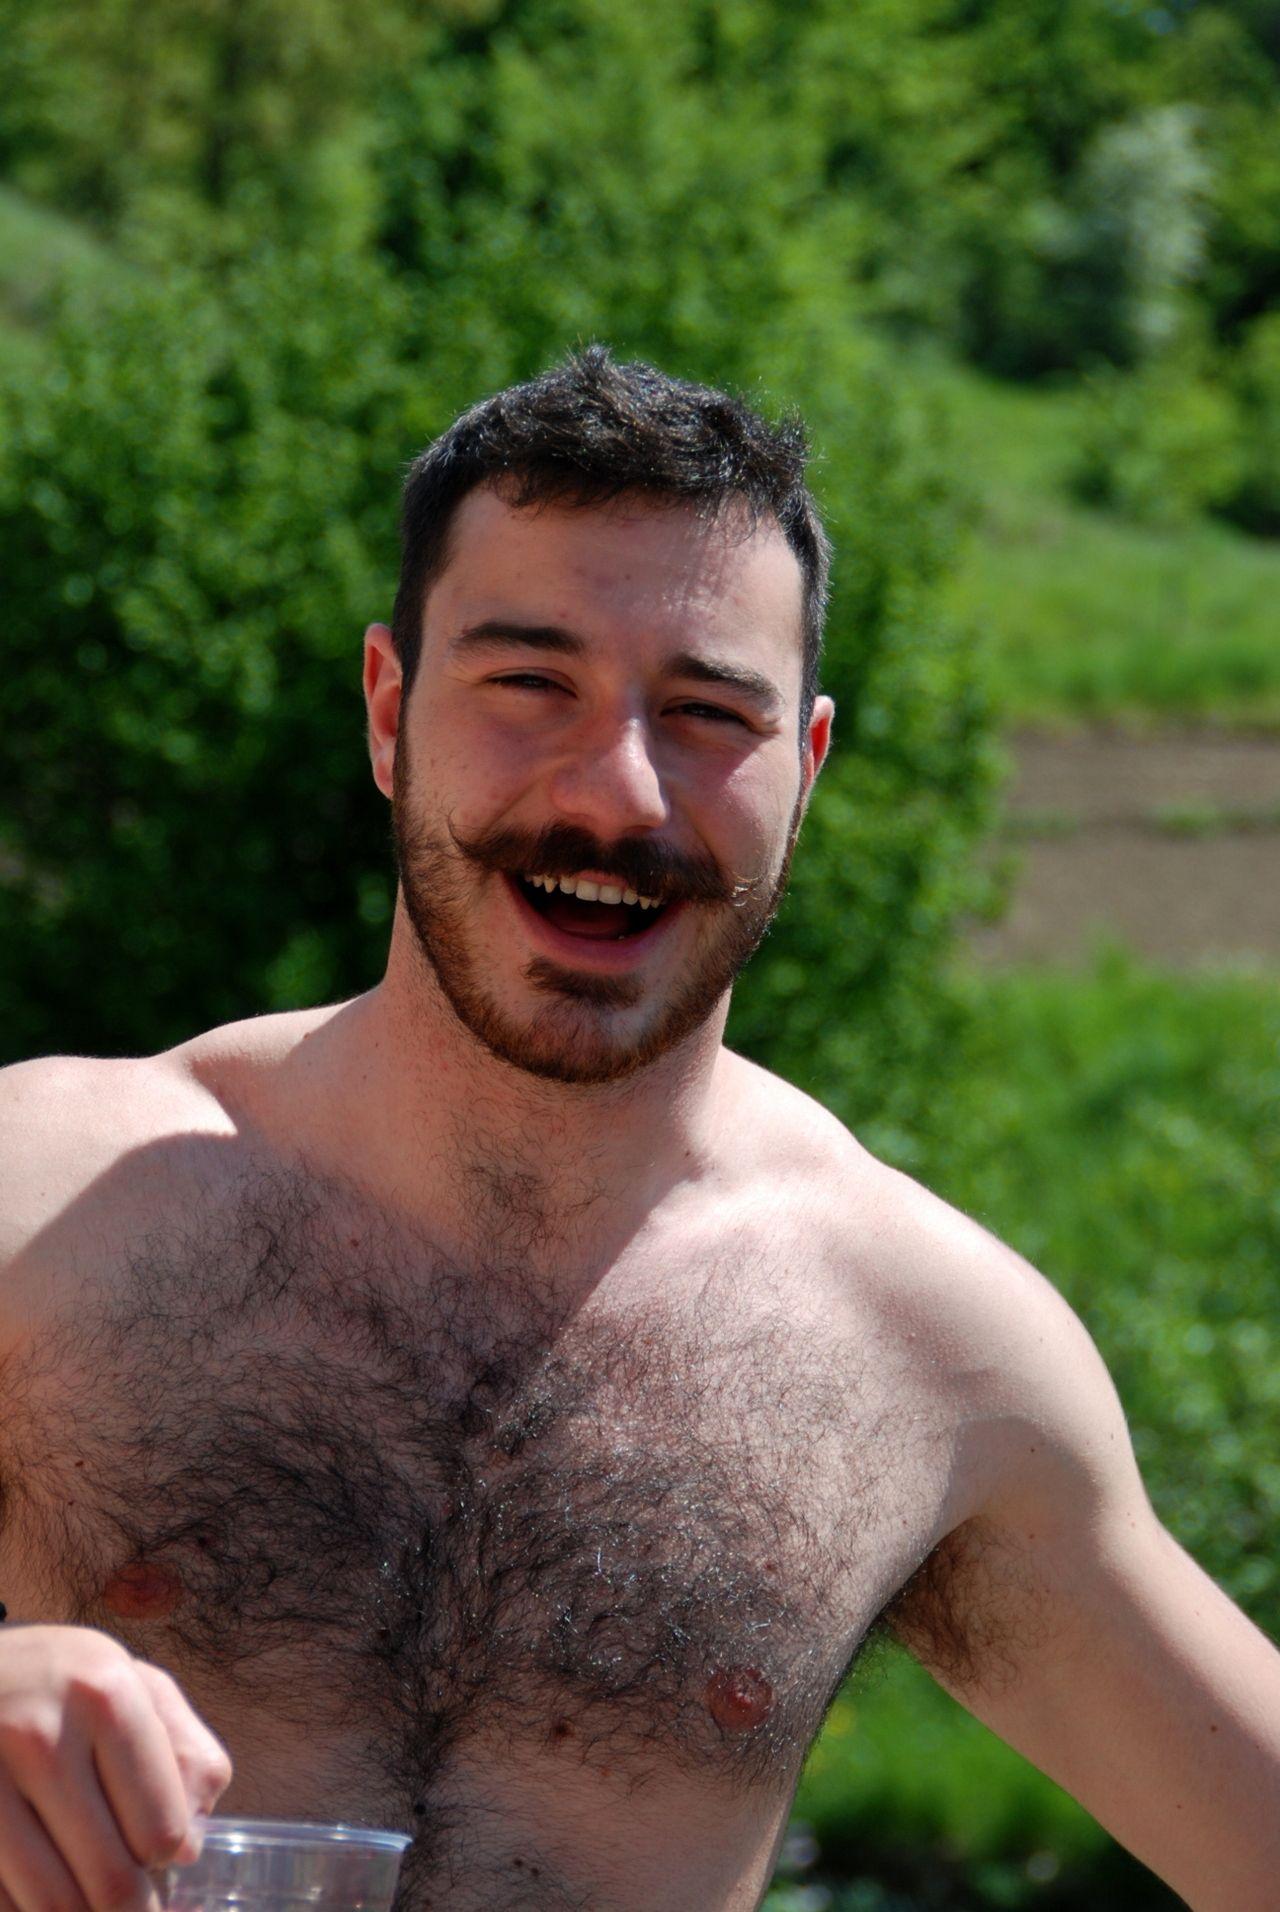 beard-00225 | beards | pinterest | mature men, hairy men and hot guys